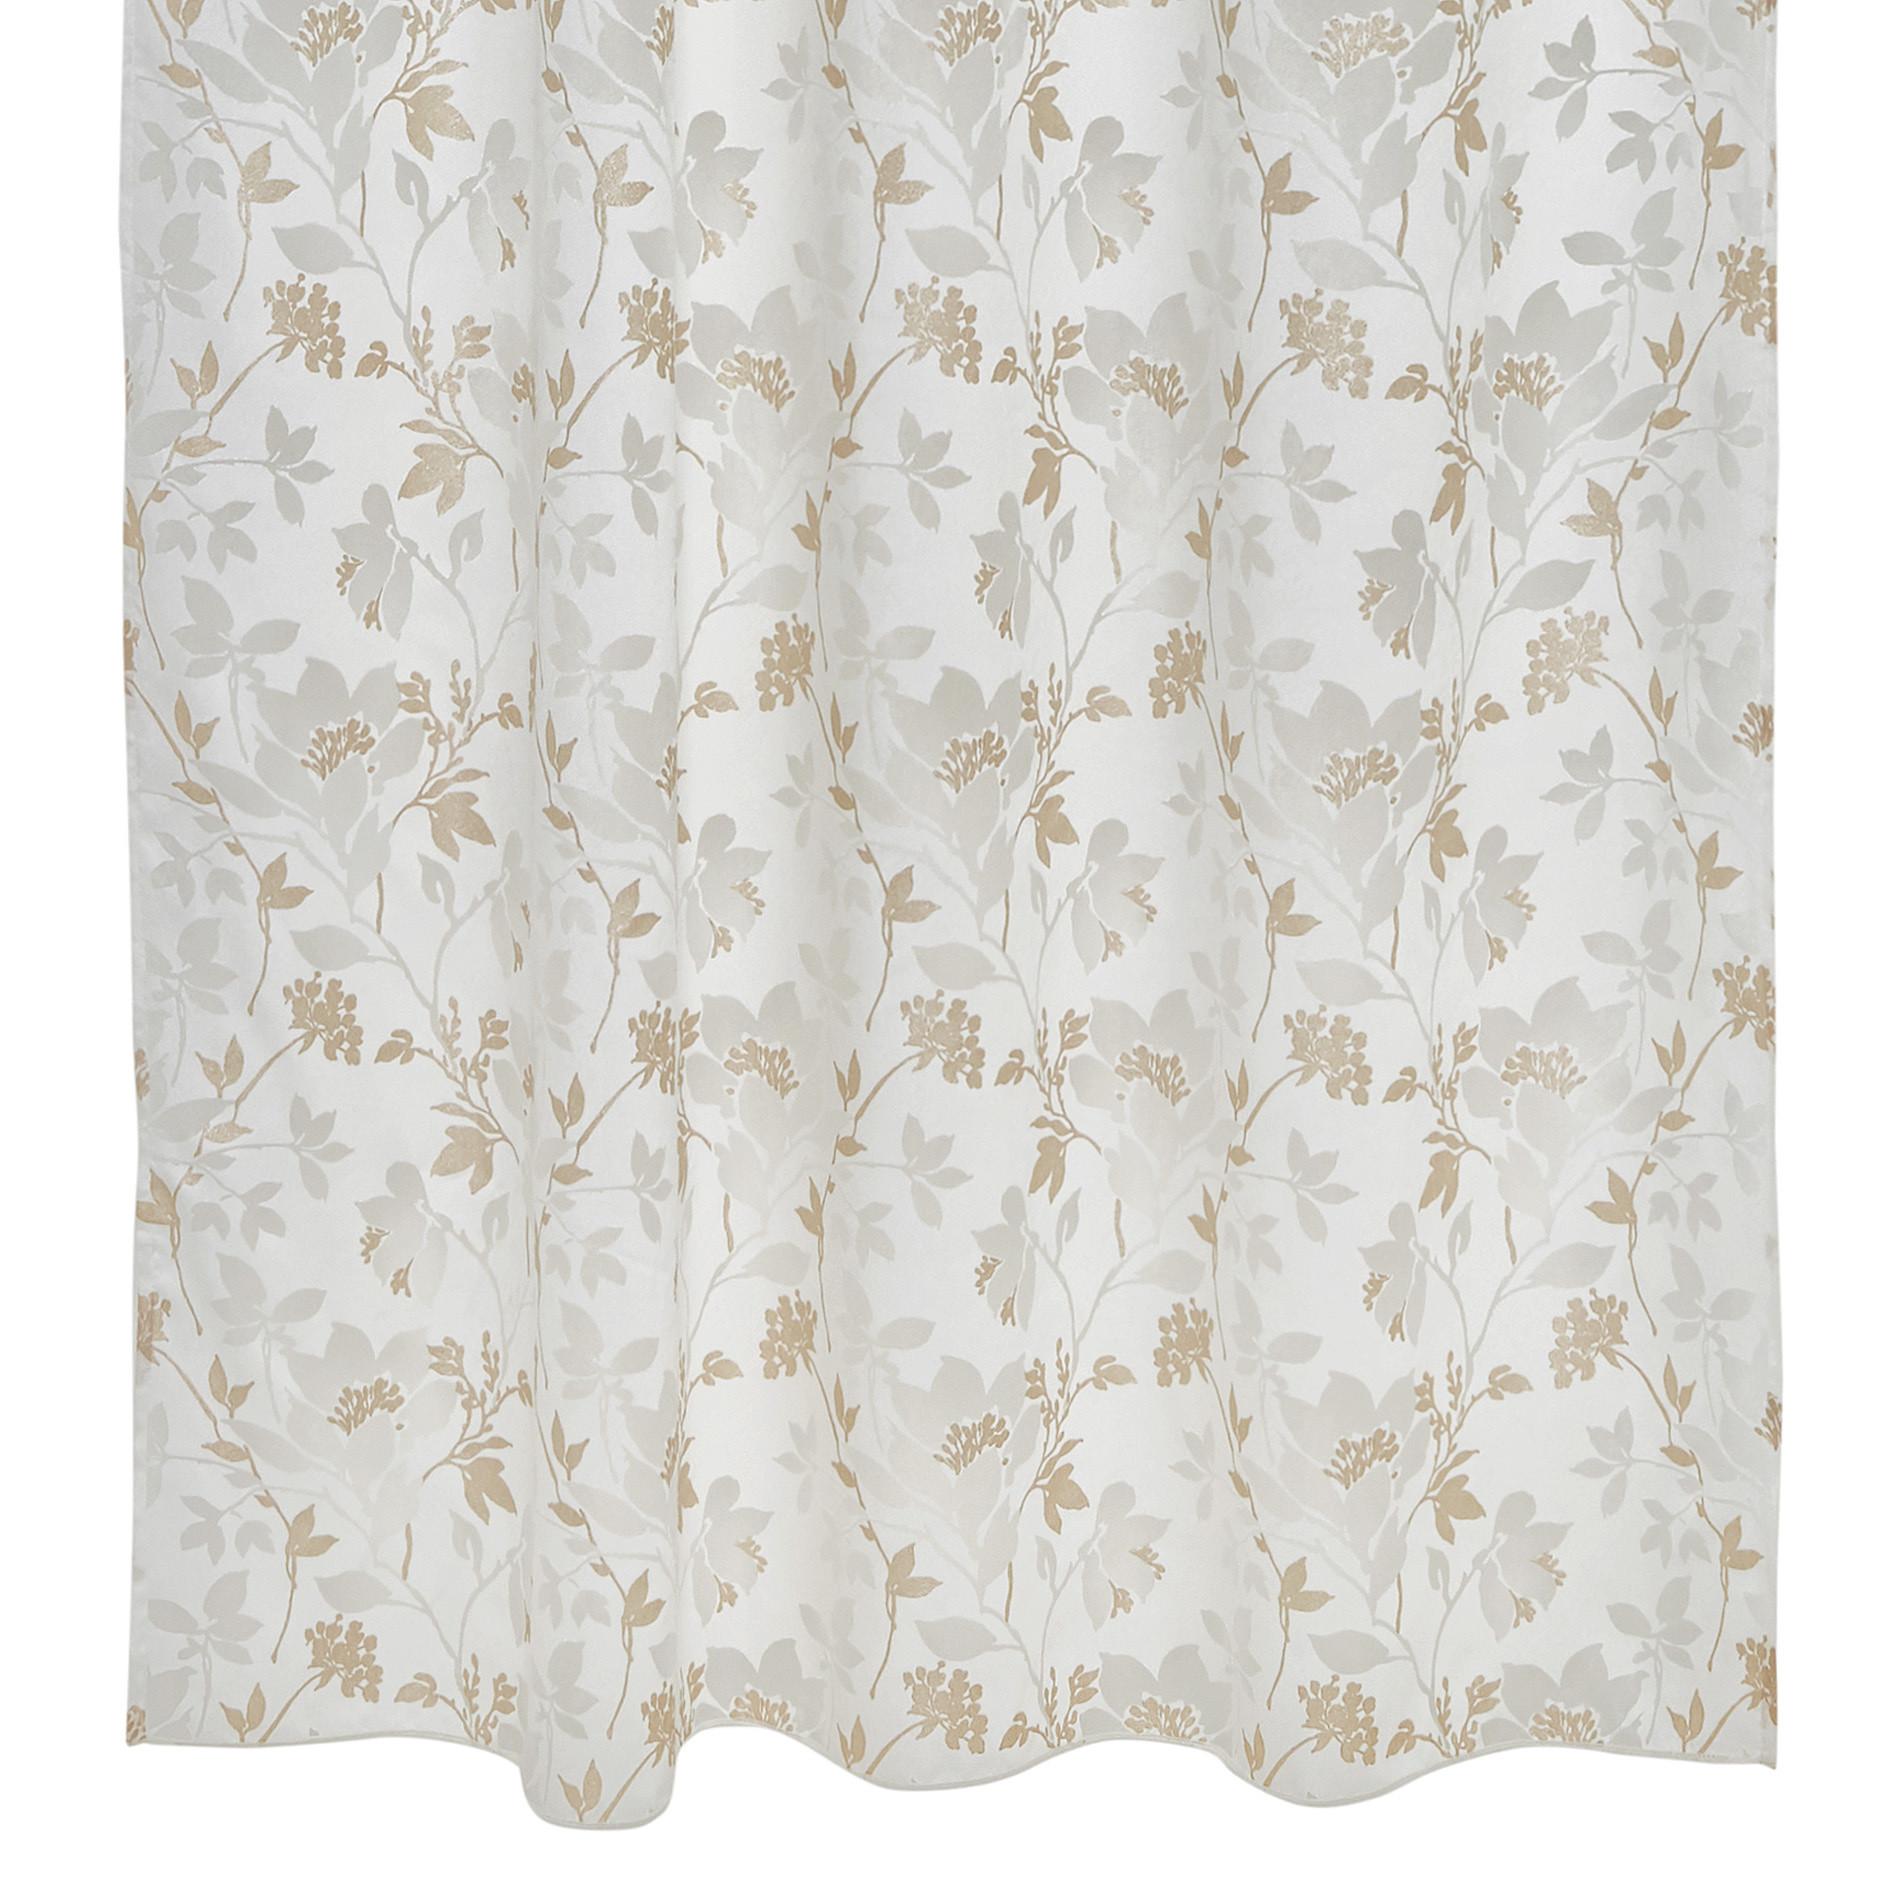 Tenda misto viscosa devore passanti nascosti, Bianco, large image number 1